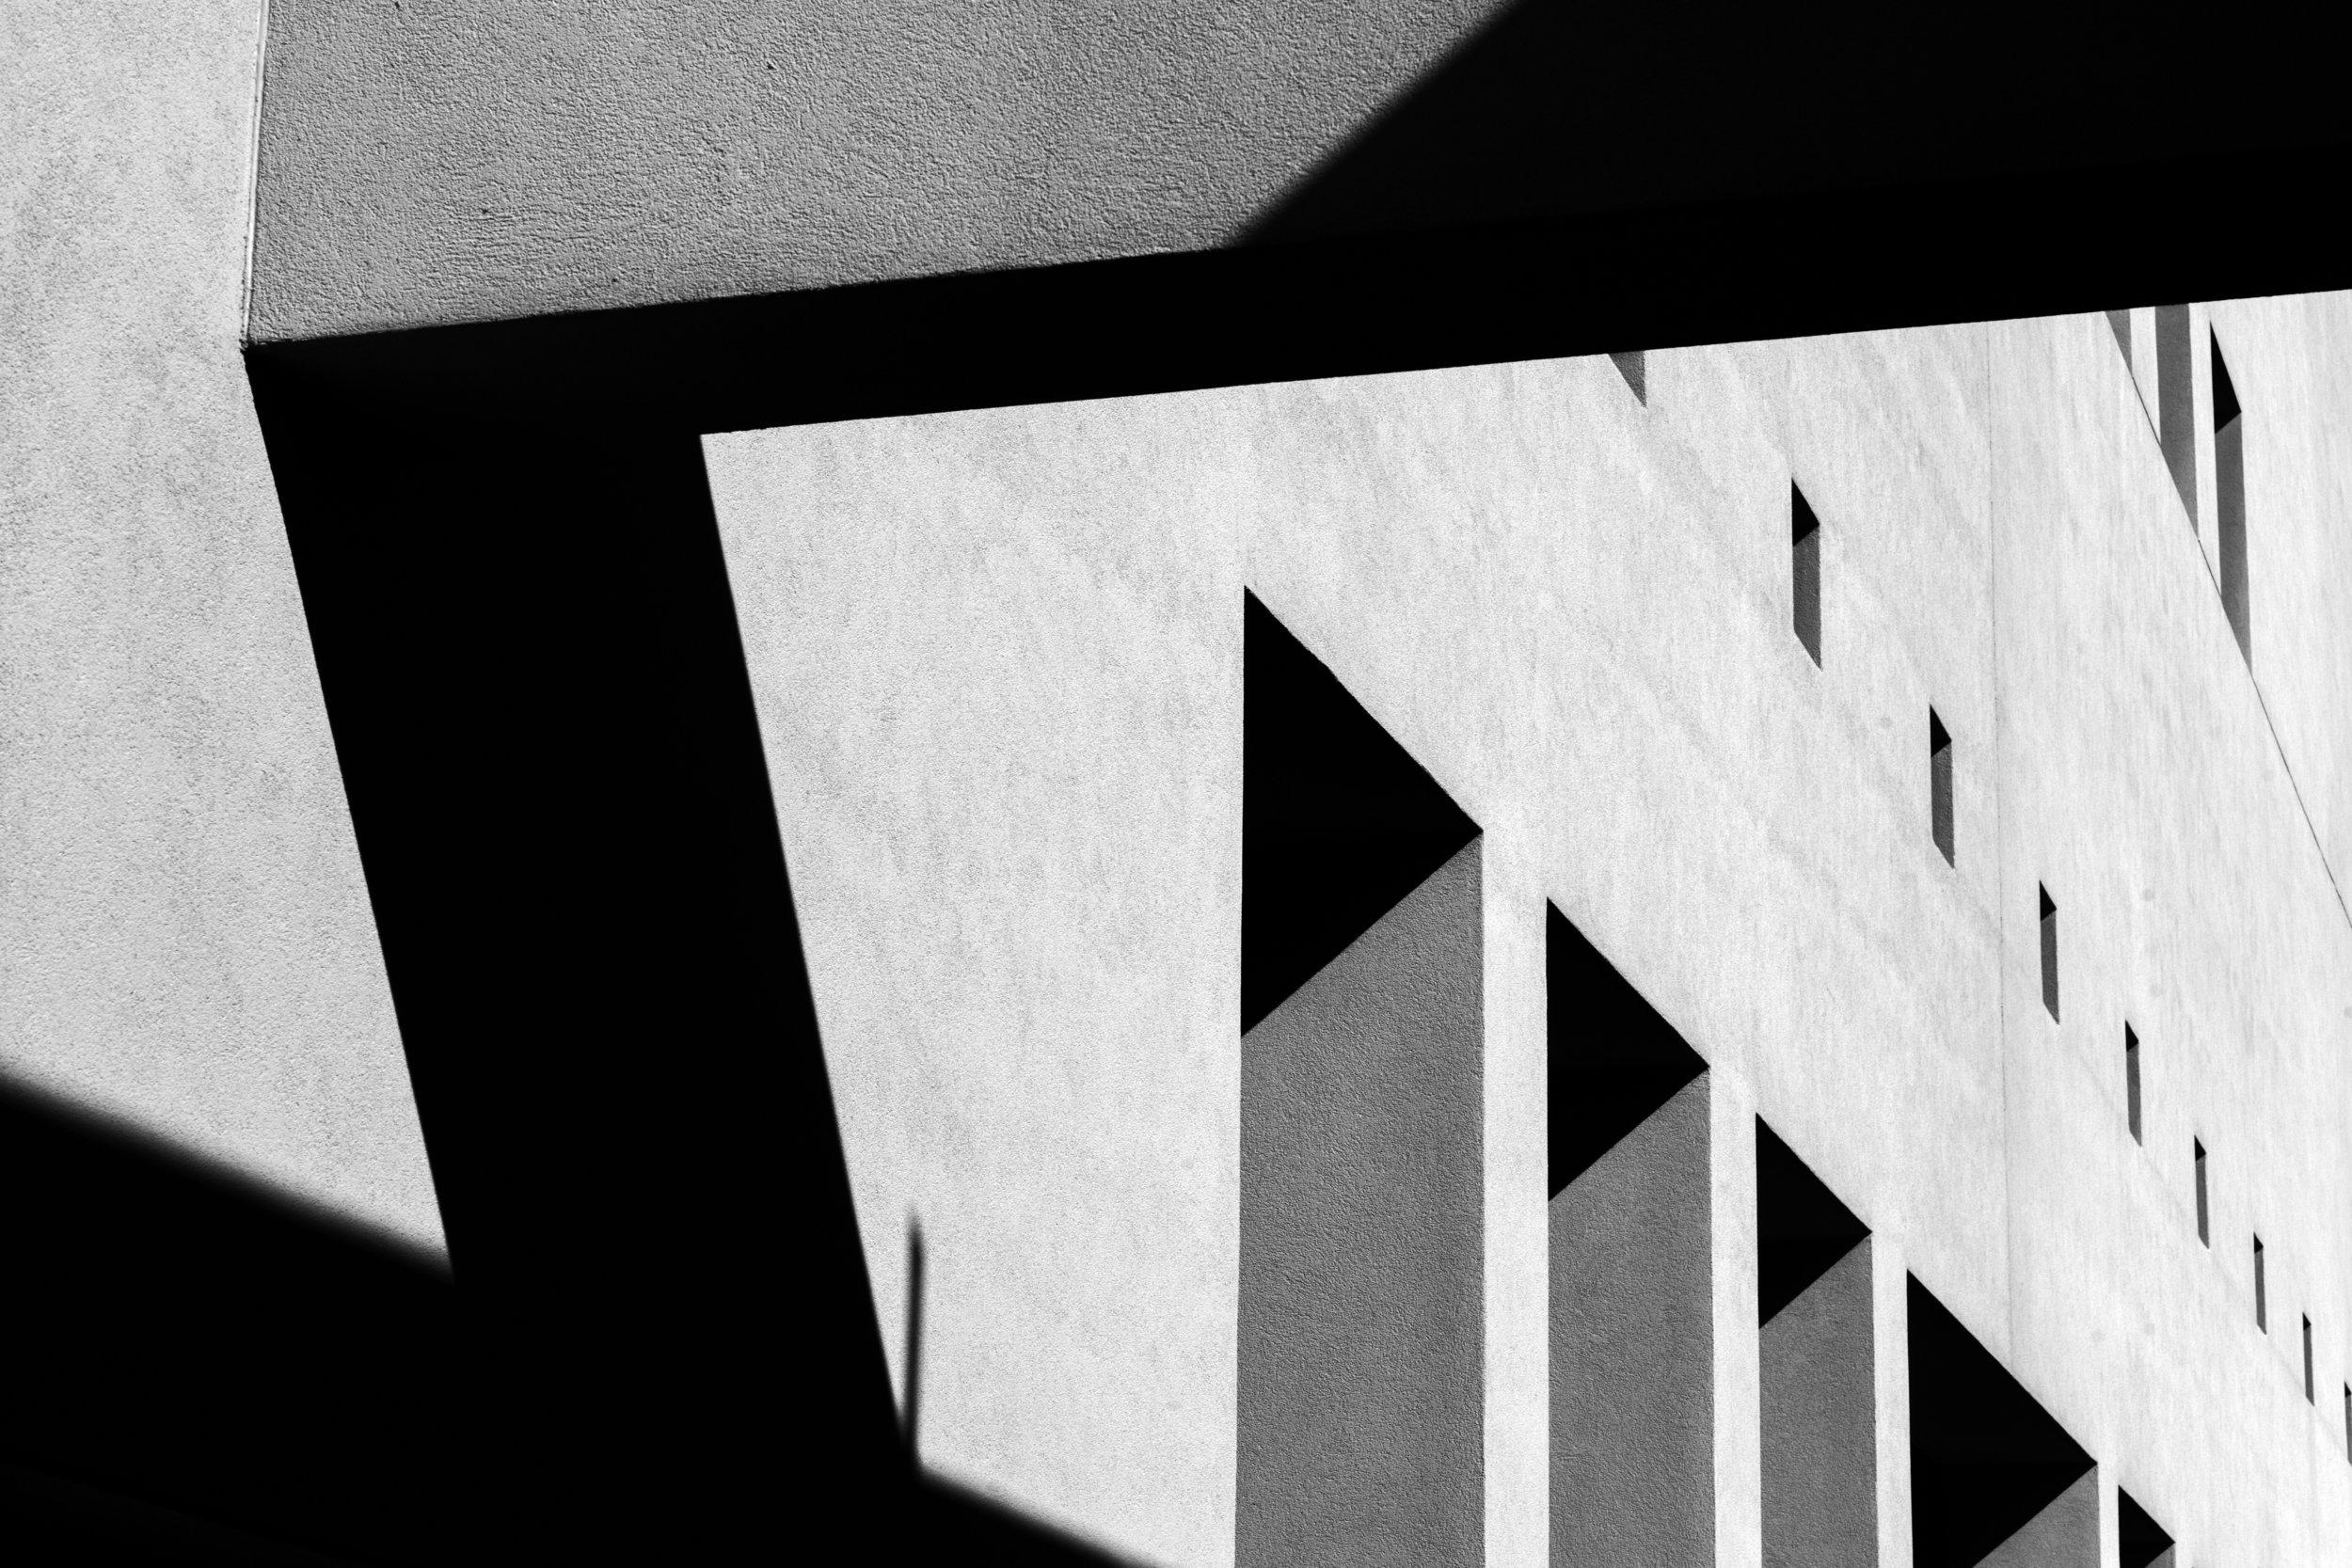 architecture_photography_fabian_villa_4.jpg